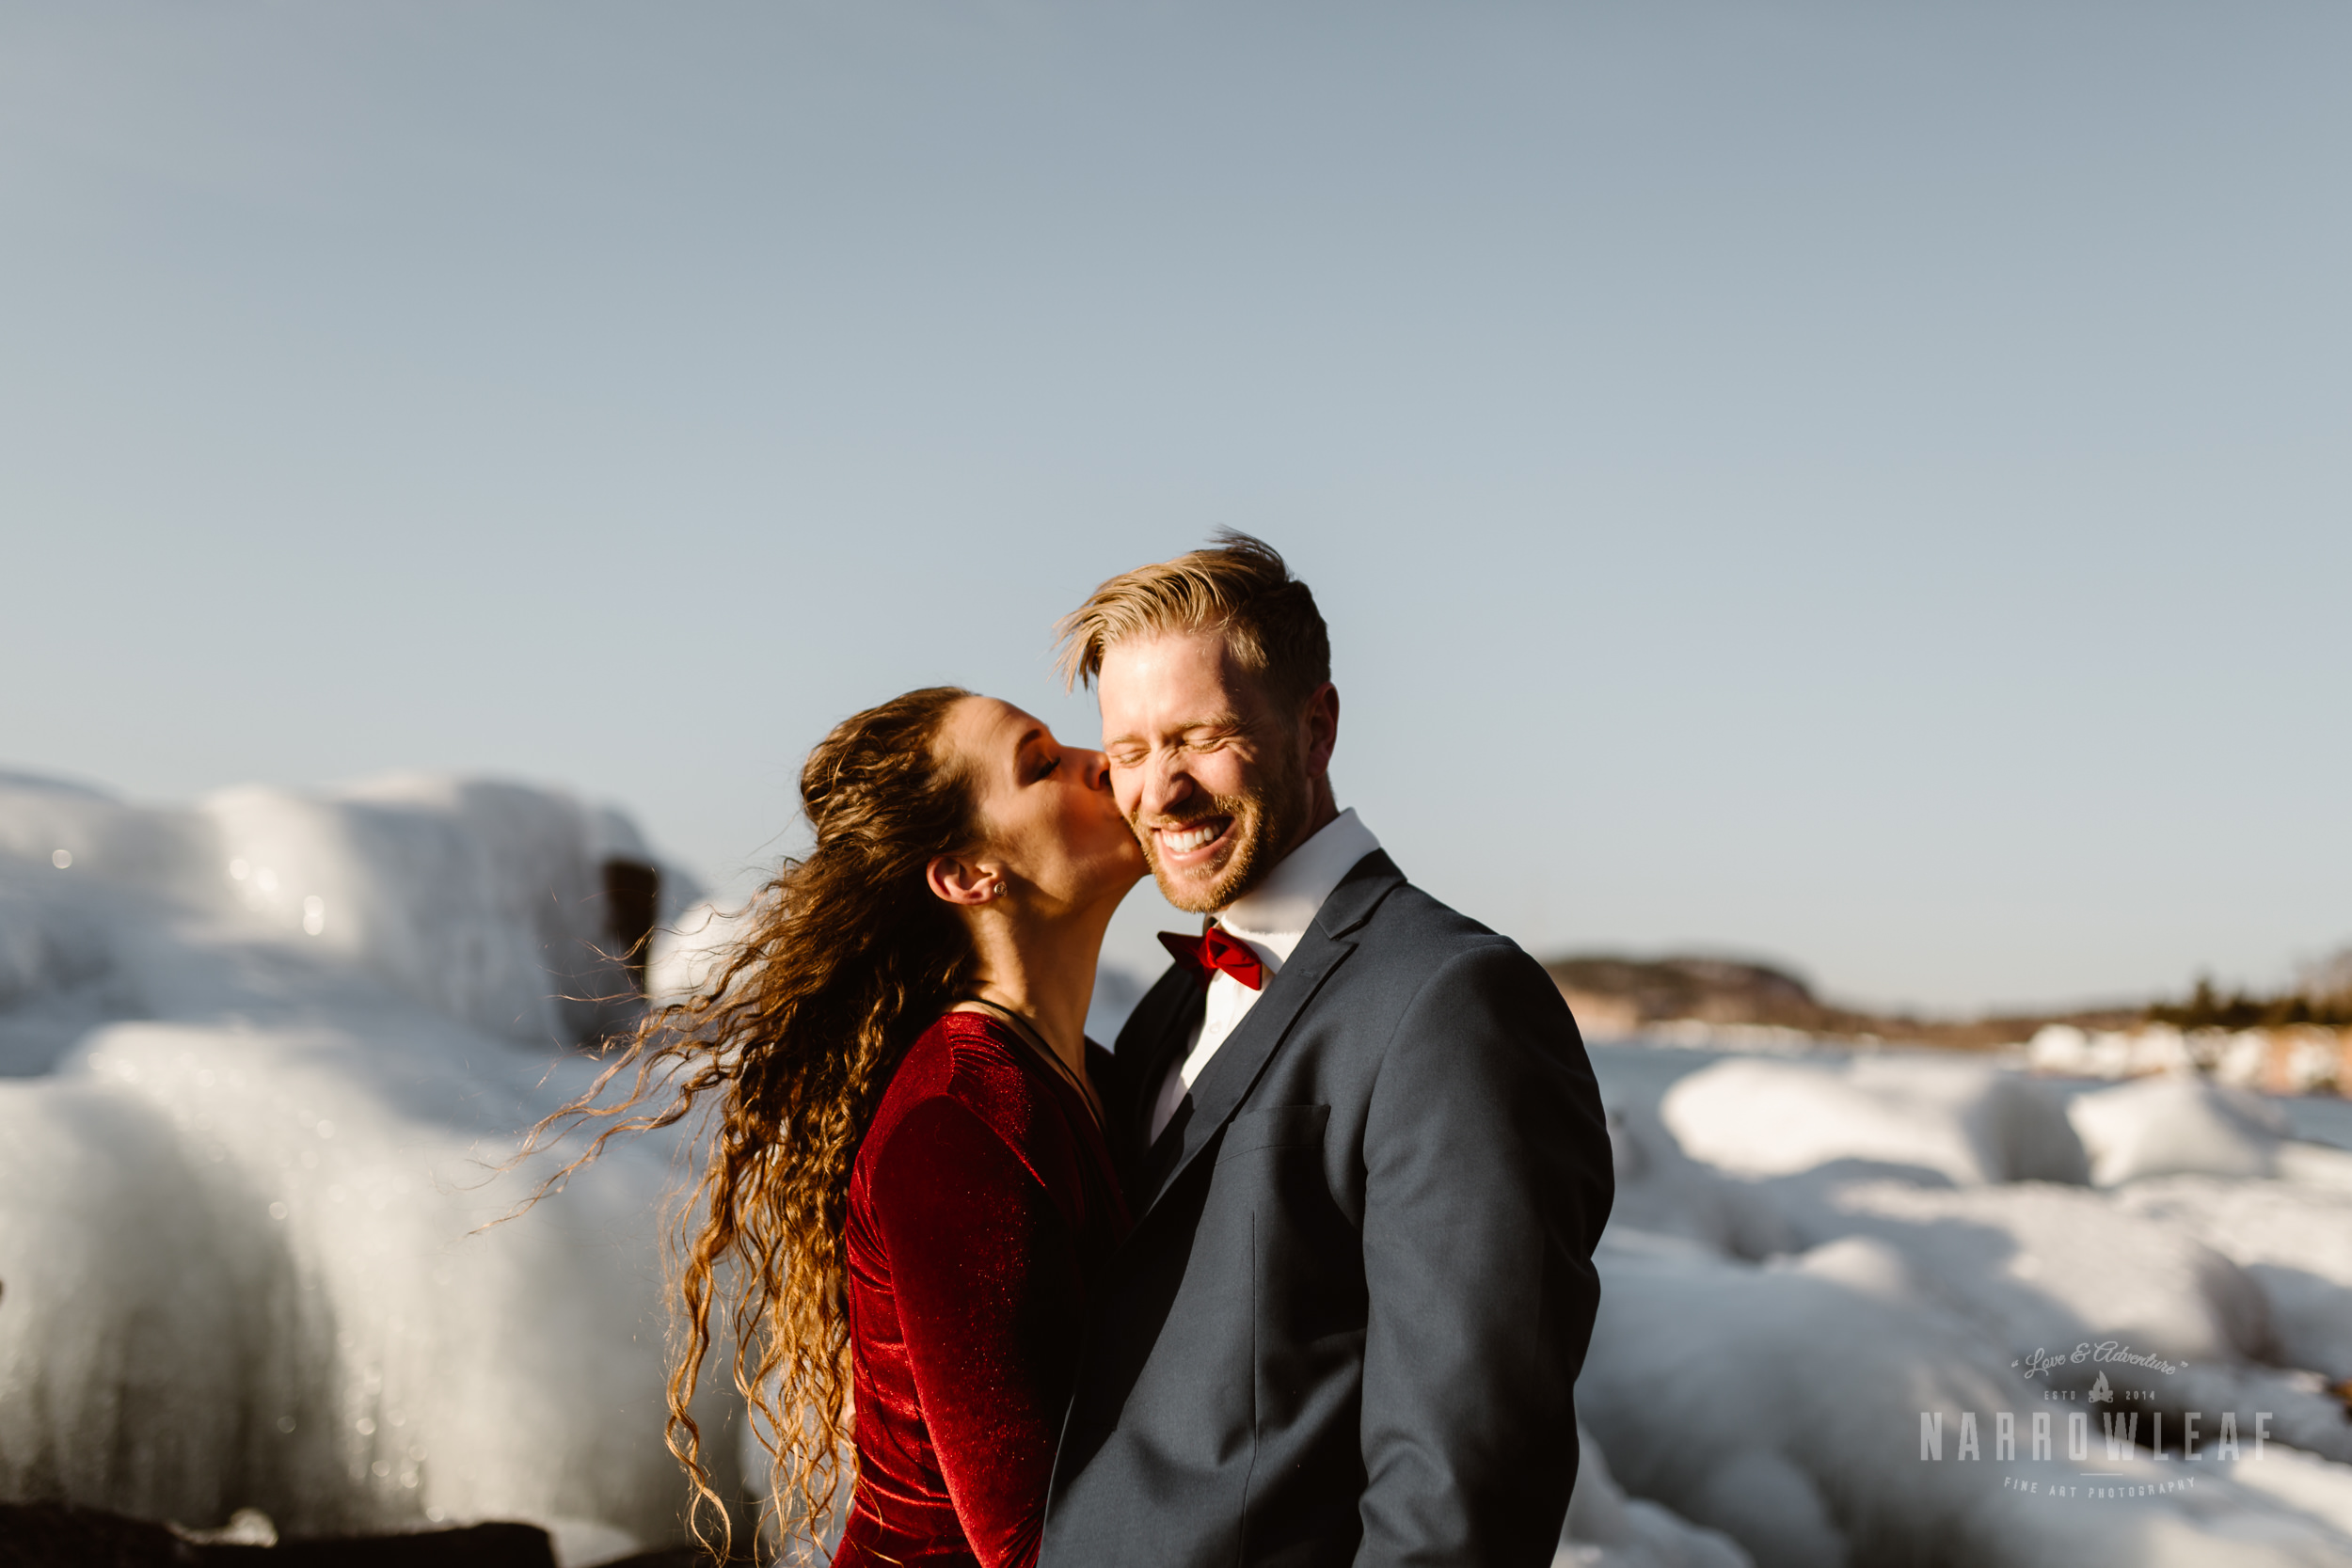 winter-adventure-elopement-tettegouche-state-park-minnesota-Narrowleaf_Love_and_Adventure_Photography-8727.jpg